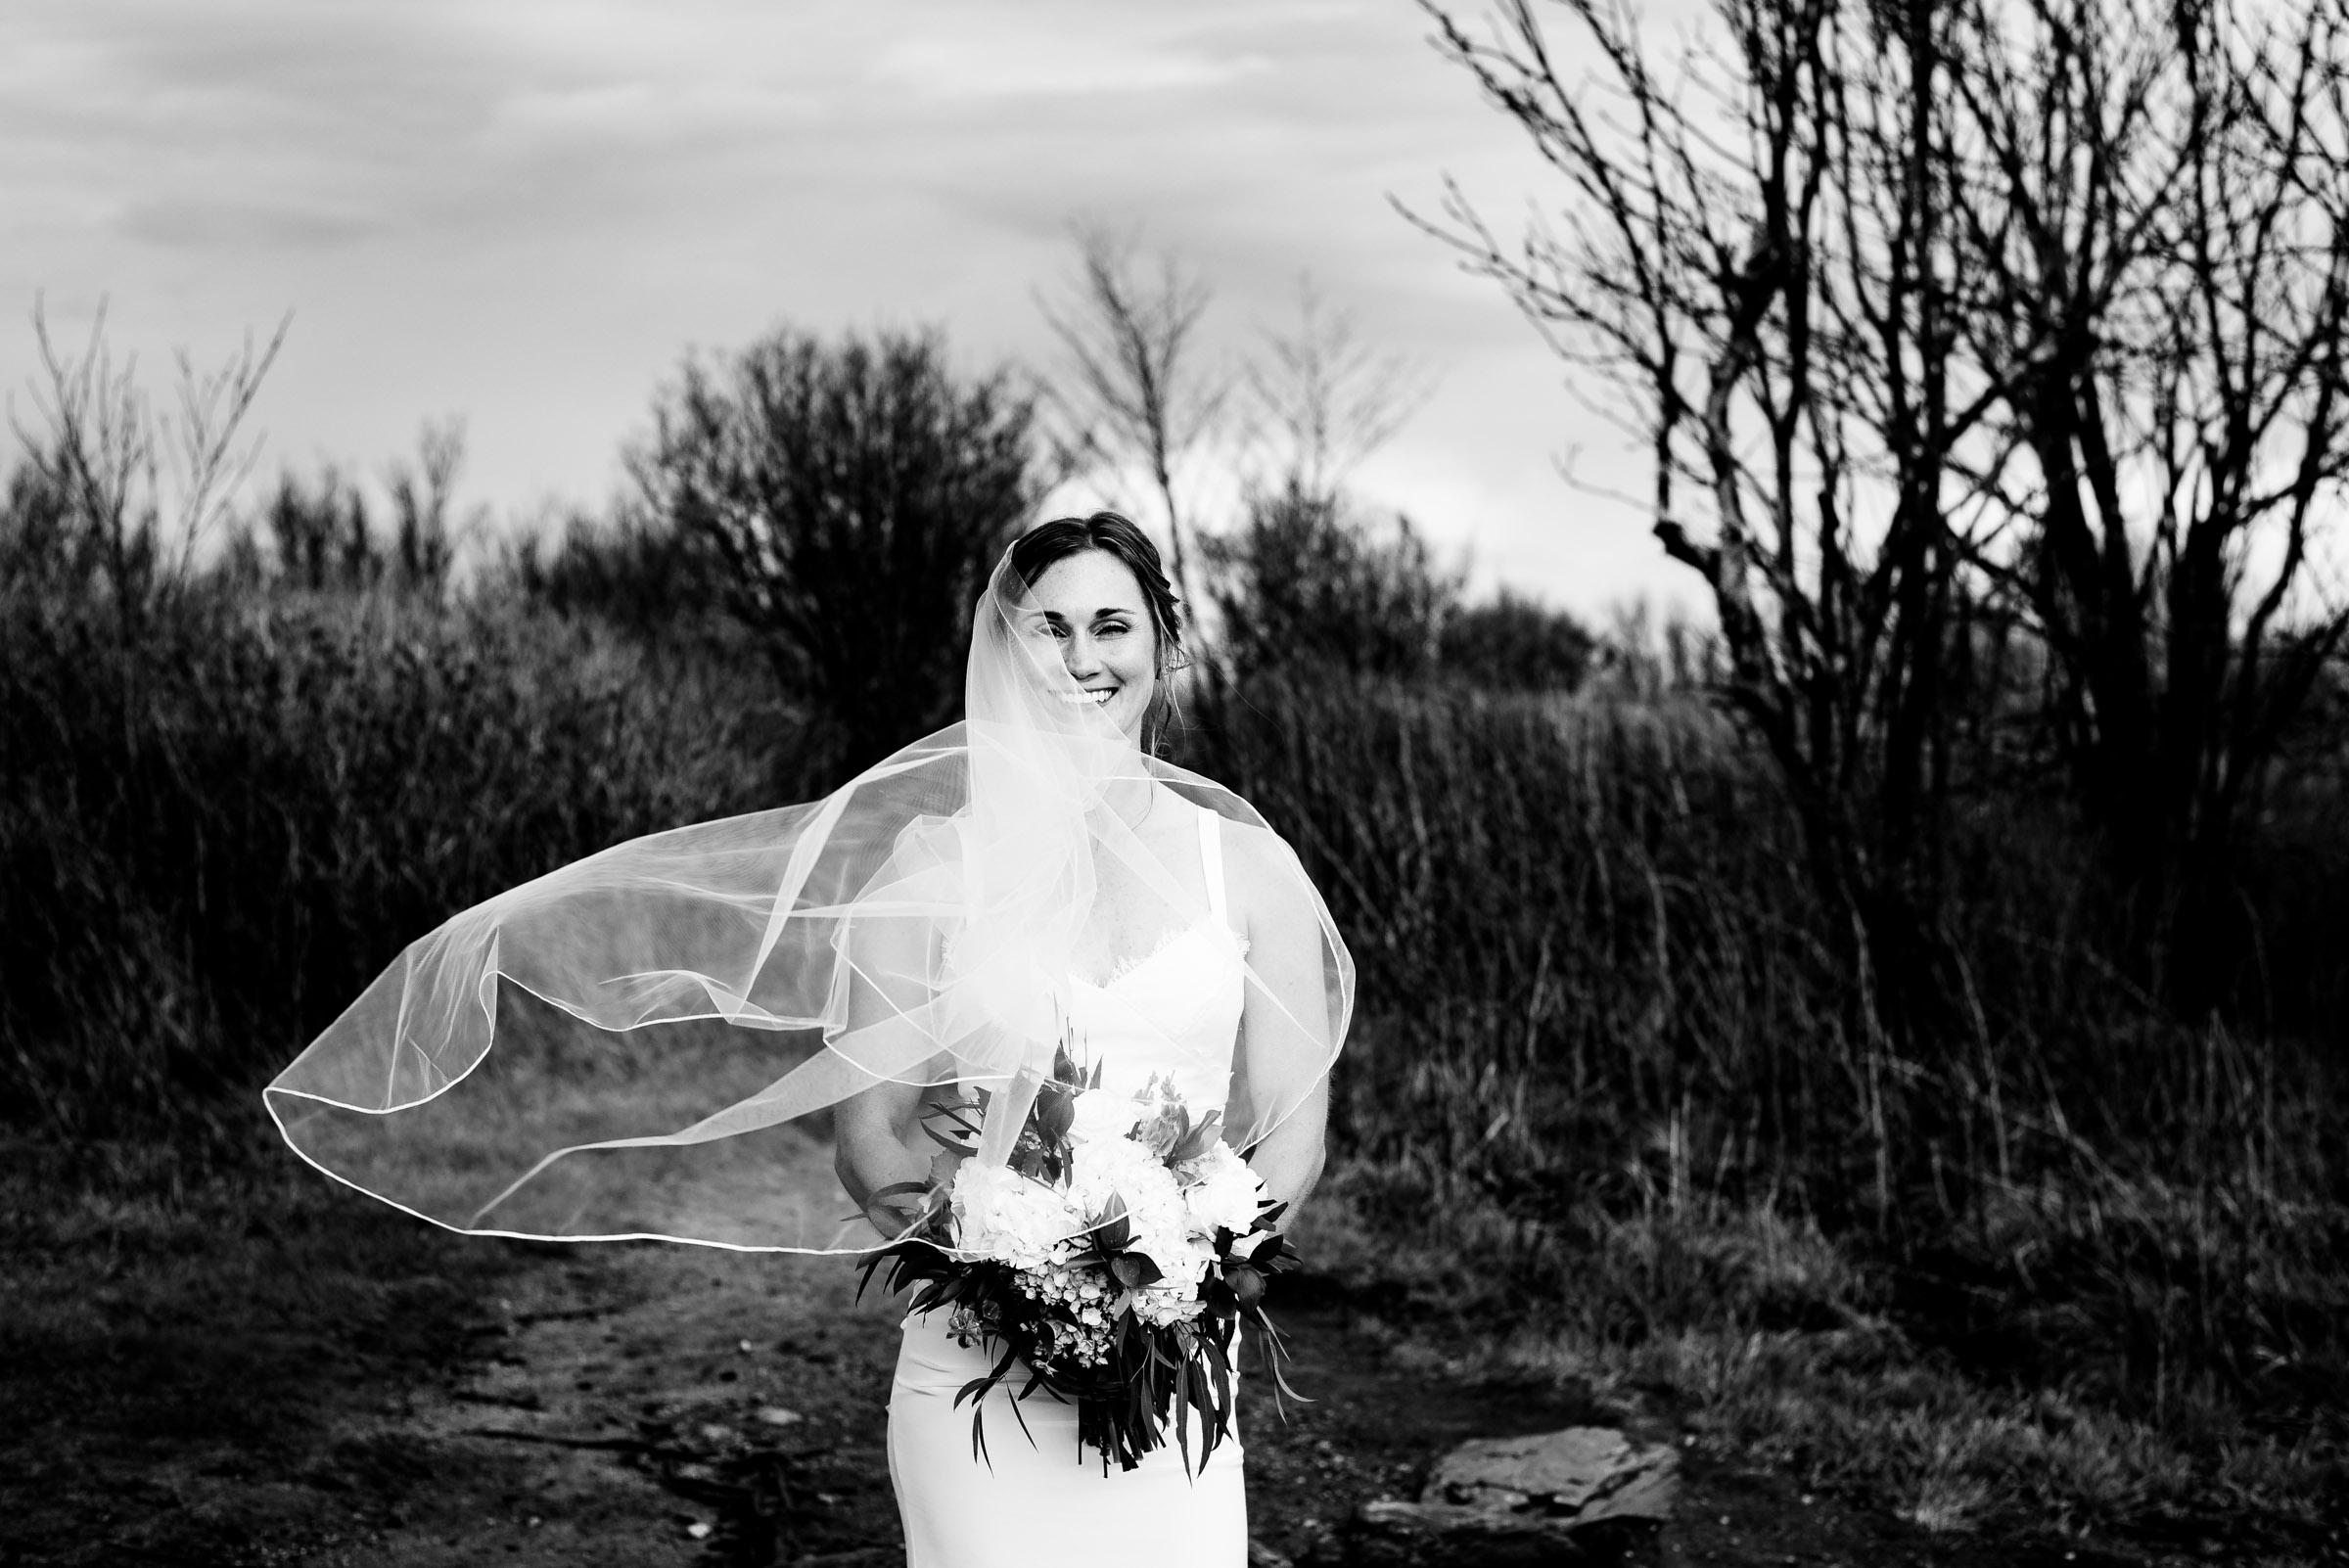 Wind blowing this adventurous brides veil